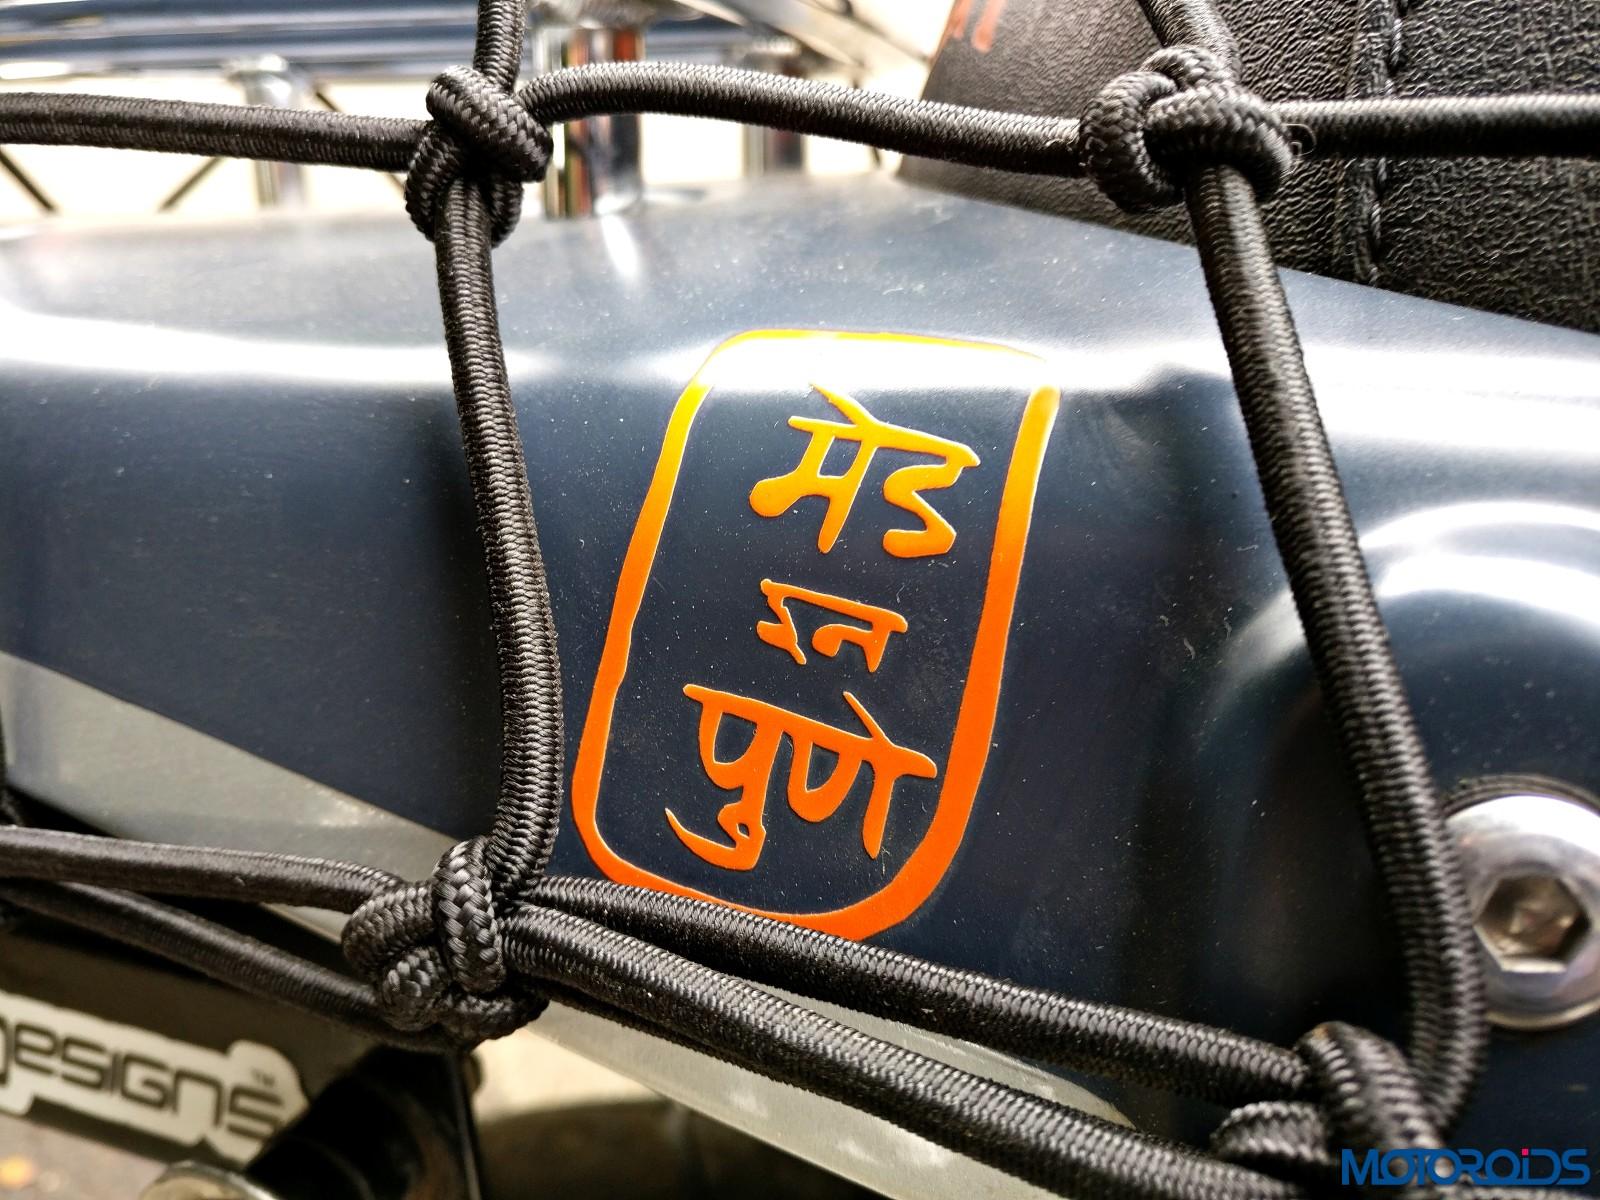 Customised Triumph Scrambler - Triumph Pune (5)